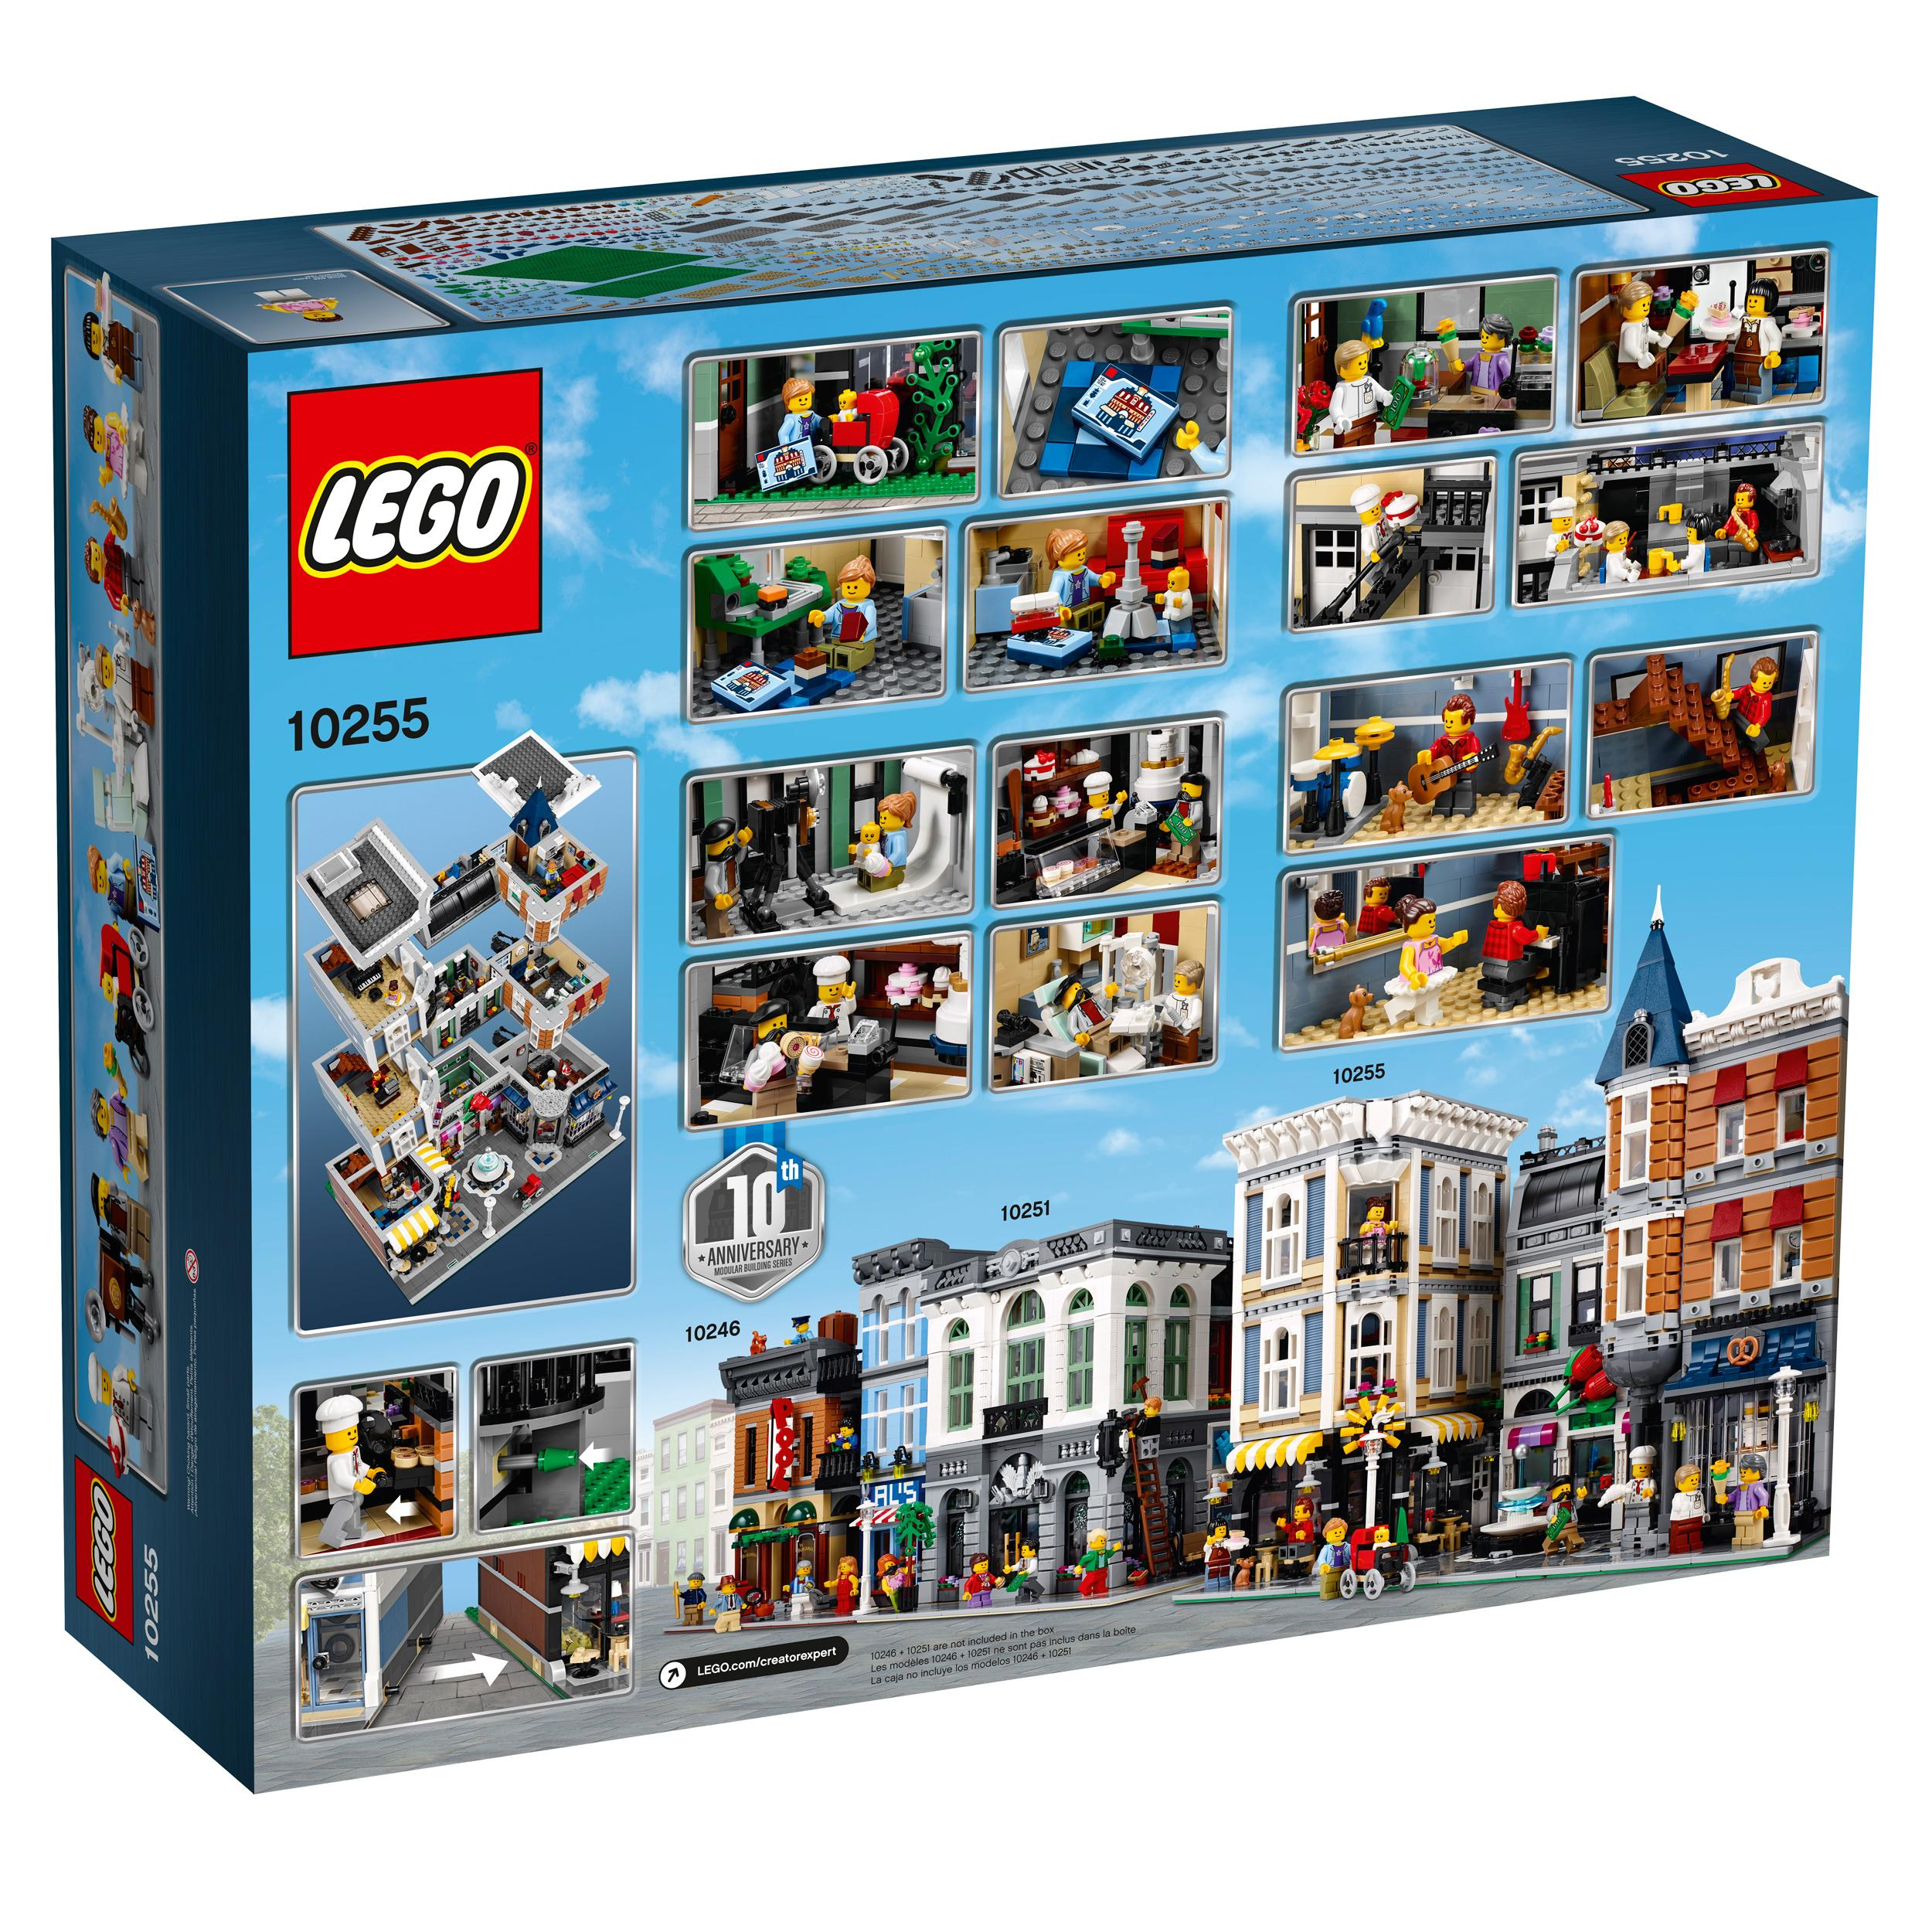 lego creator expert assembly square 10255. Black Bedroom Furniture Sets. Home Design Ideas